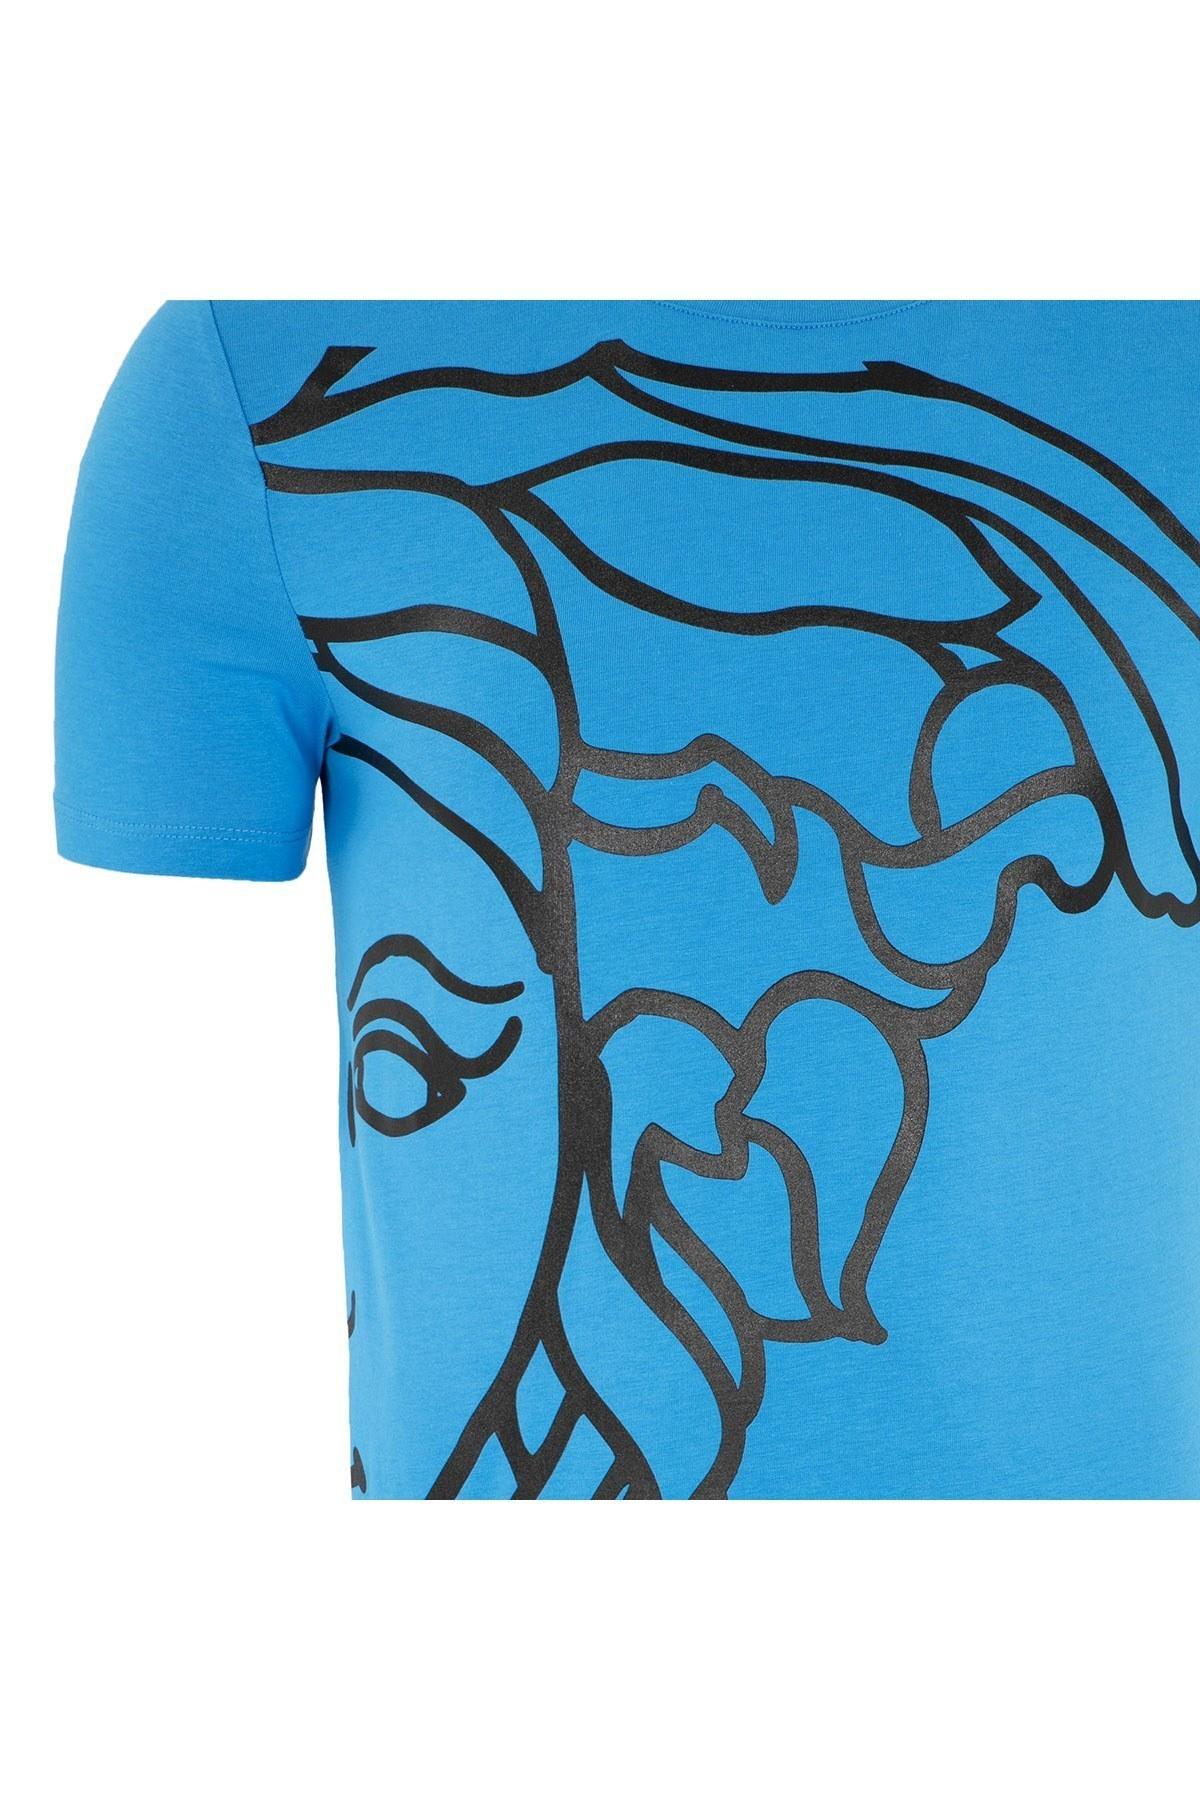 VERSACE COLLECTION T SHIRT Erkek T Shirt V800683S VJ00477 V1375 SAKS